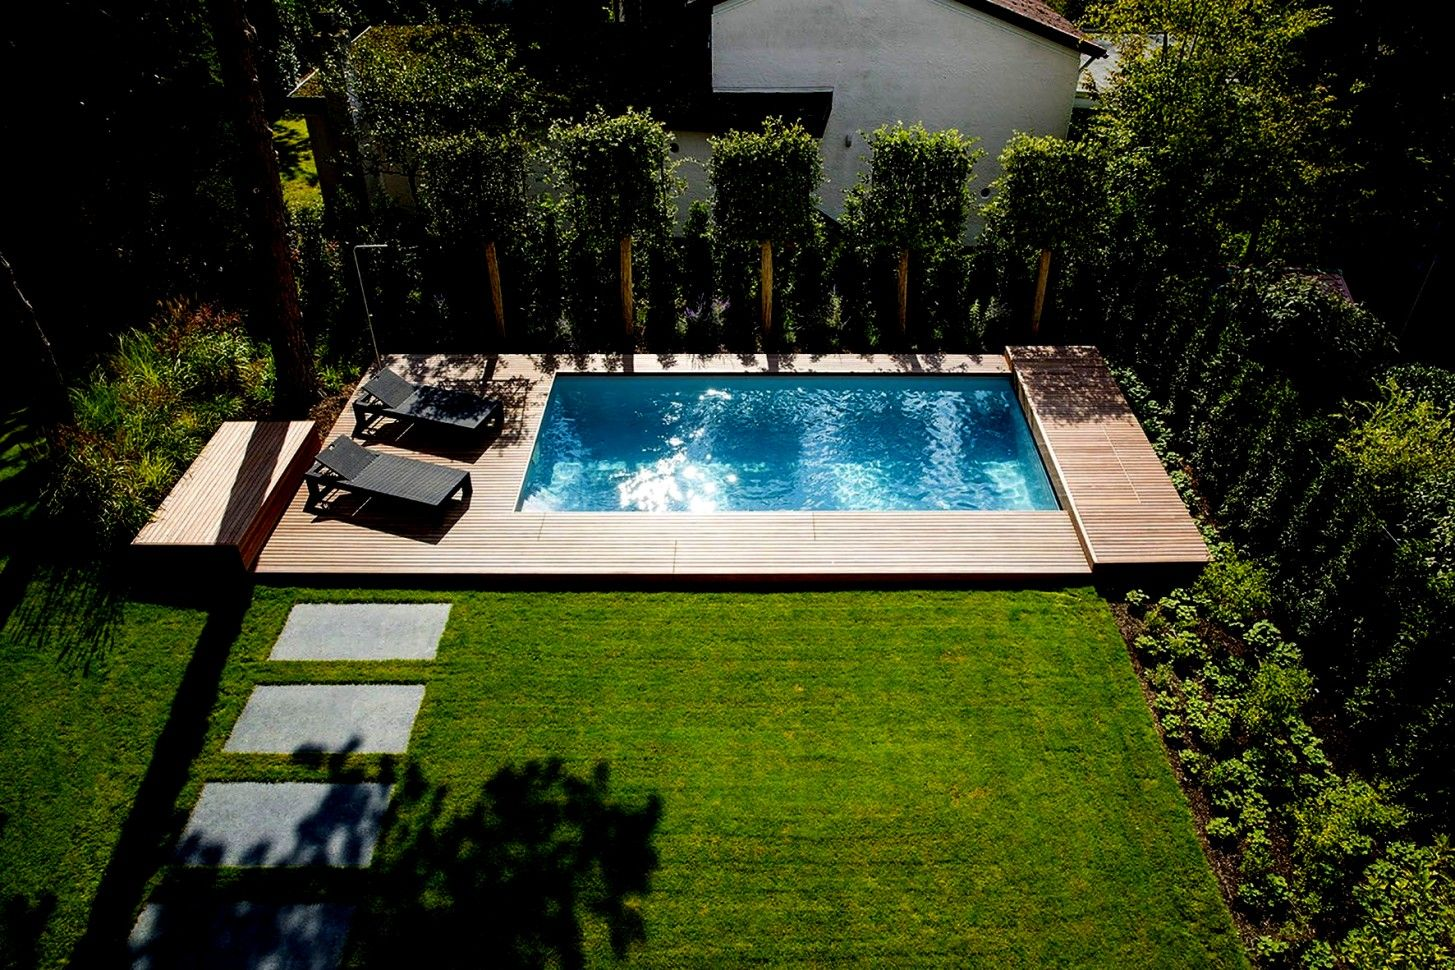 Pool Deko Bilder Bilder Deko Pool Pool Landscape Design Backyard Pool Landscaping Swimming Pools Backyard